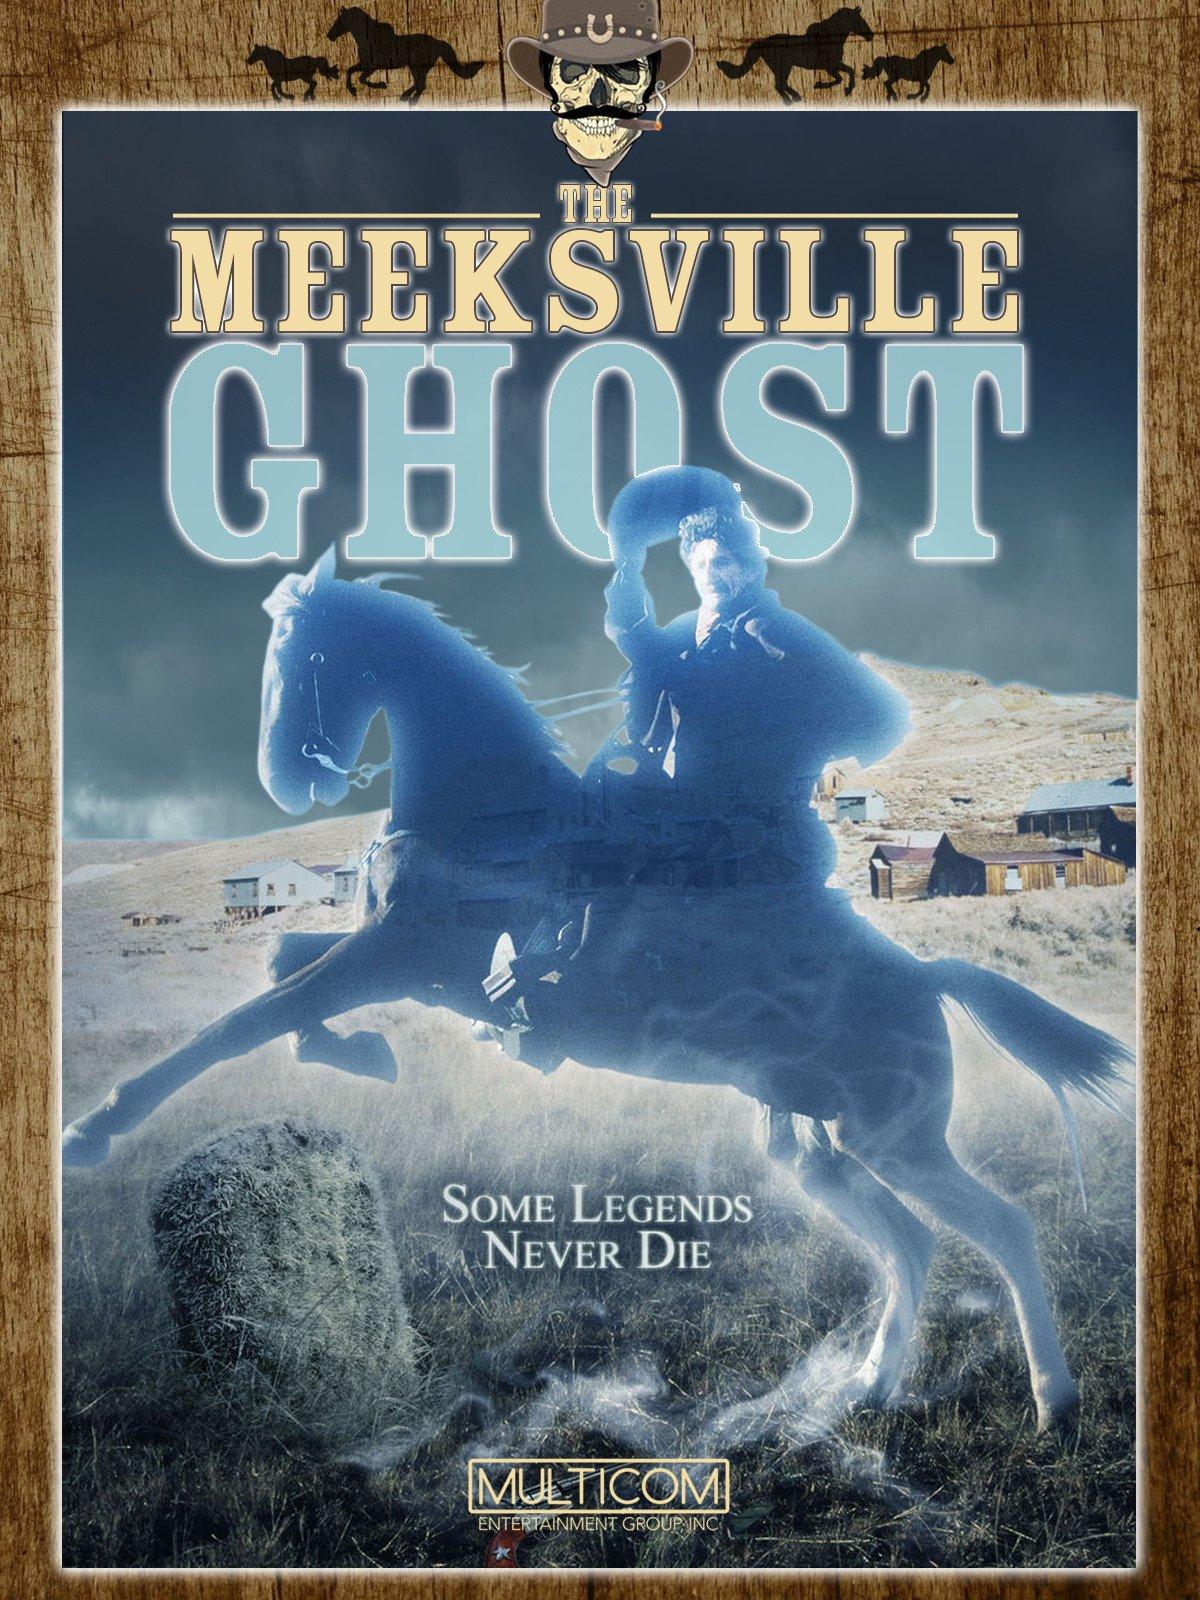 The Meeksville Ghost